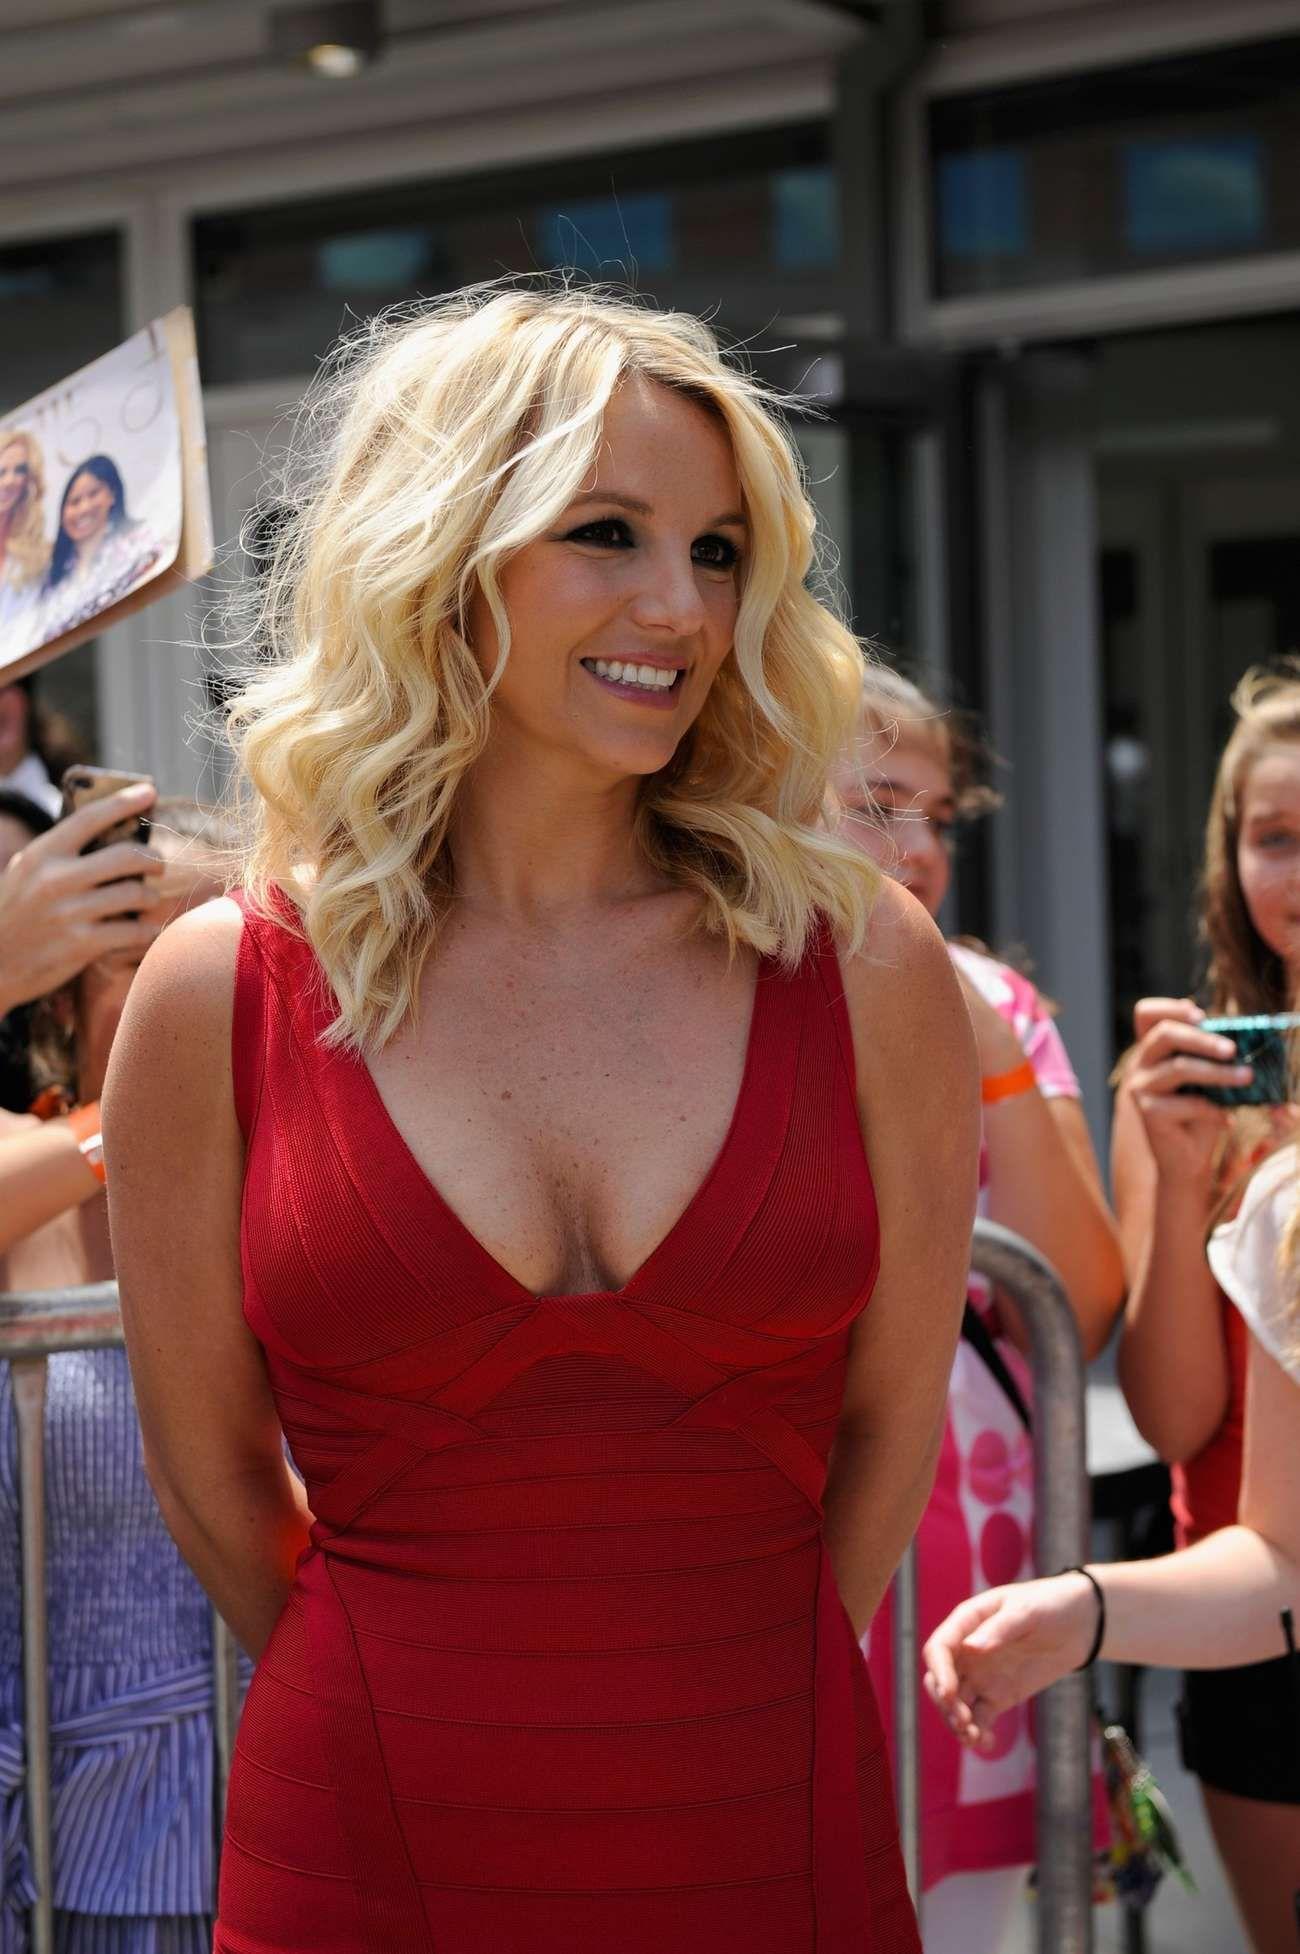 Britney Spears 2012 Britney Spears Pinterest Britney Spears